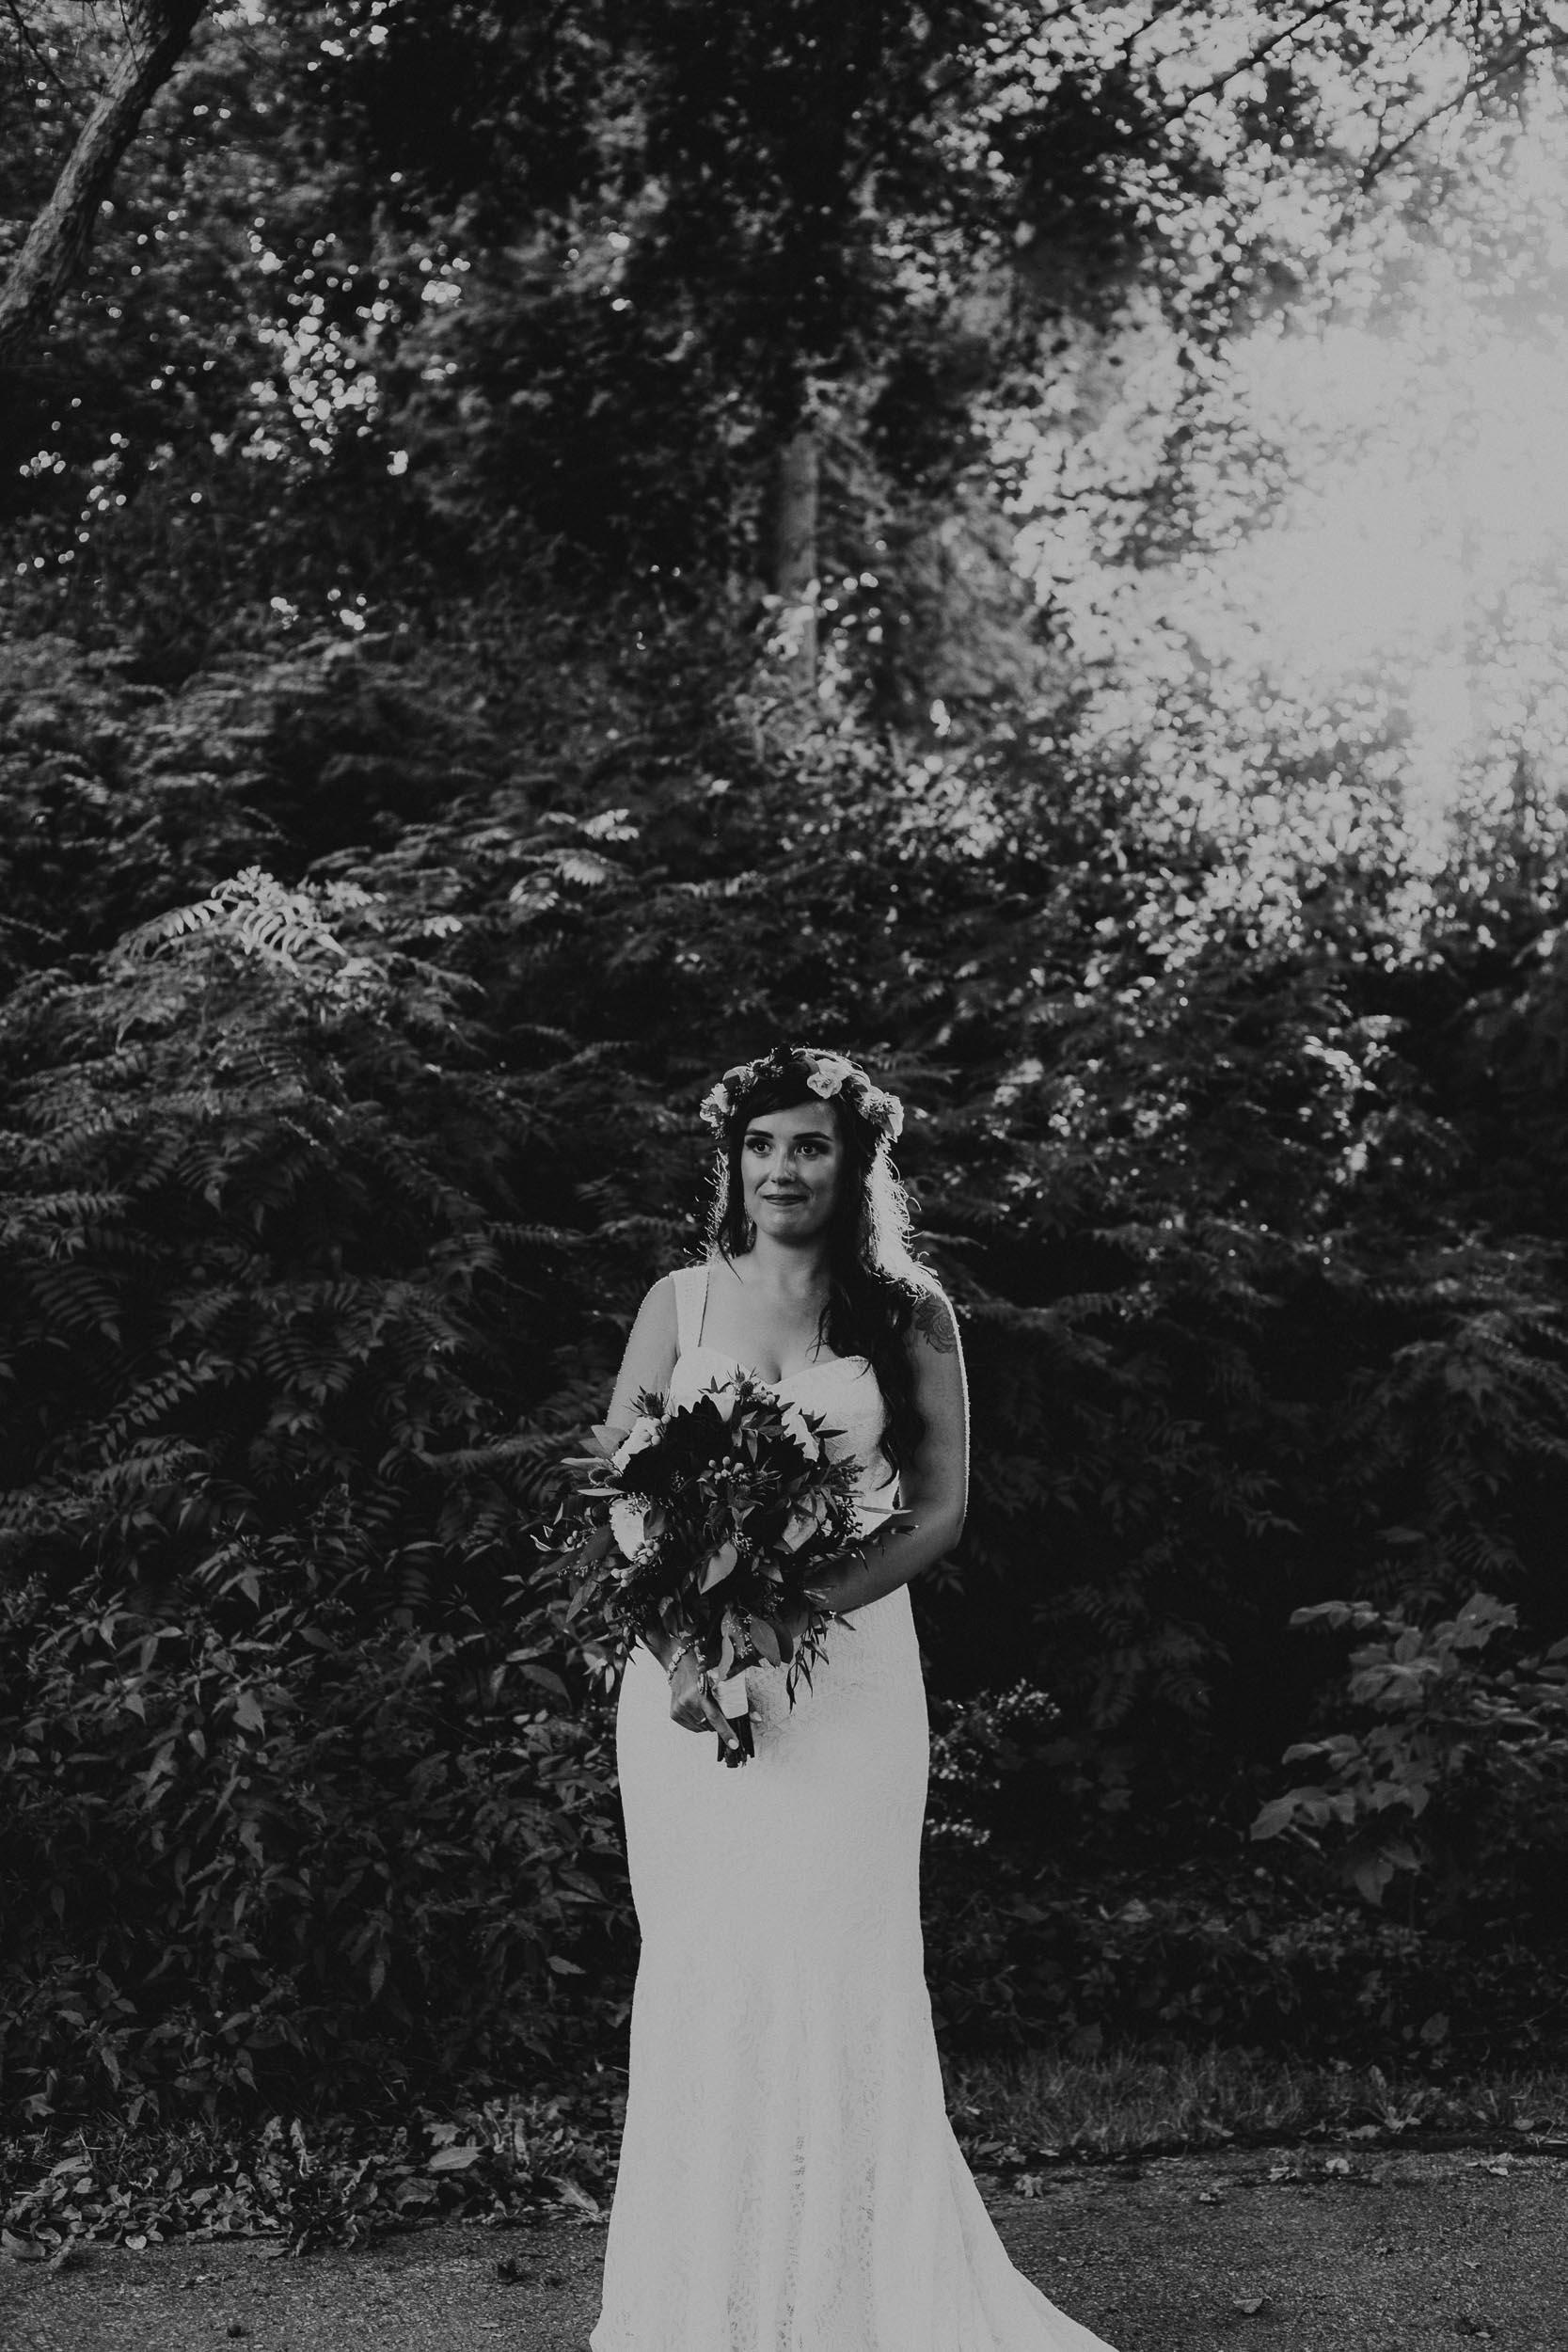 intimate-wedding-elopement-photographer-ottawa-toronto-7872.jpg